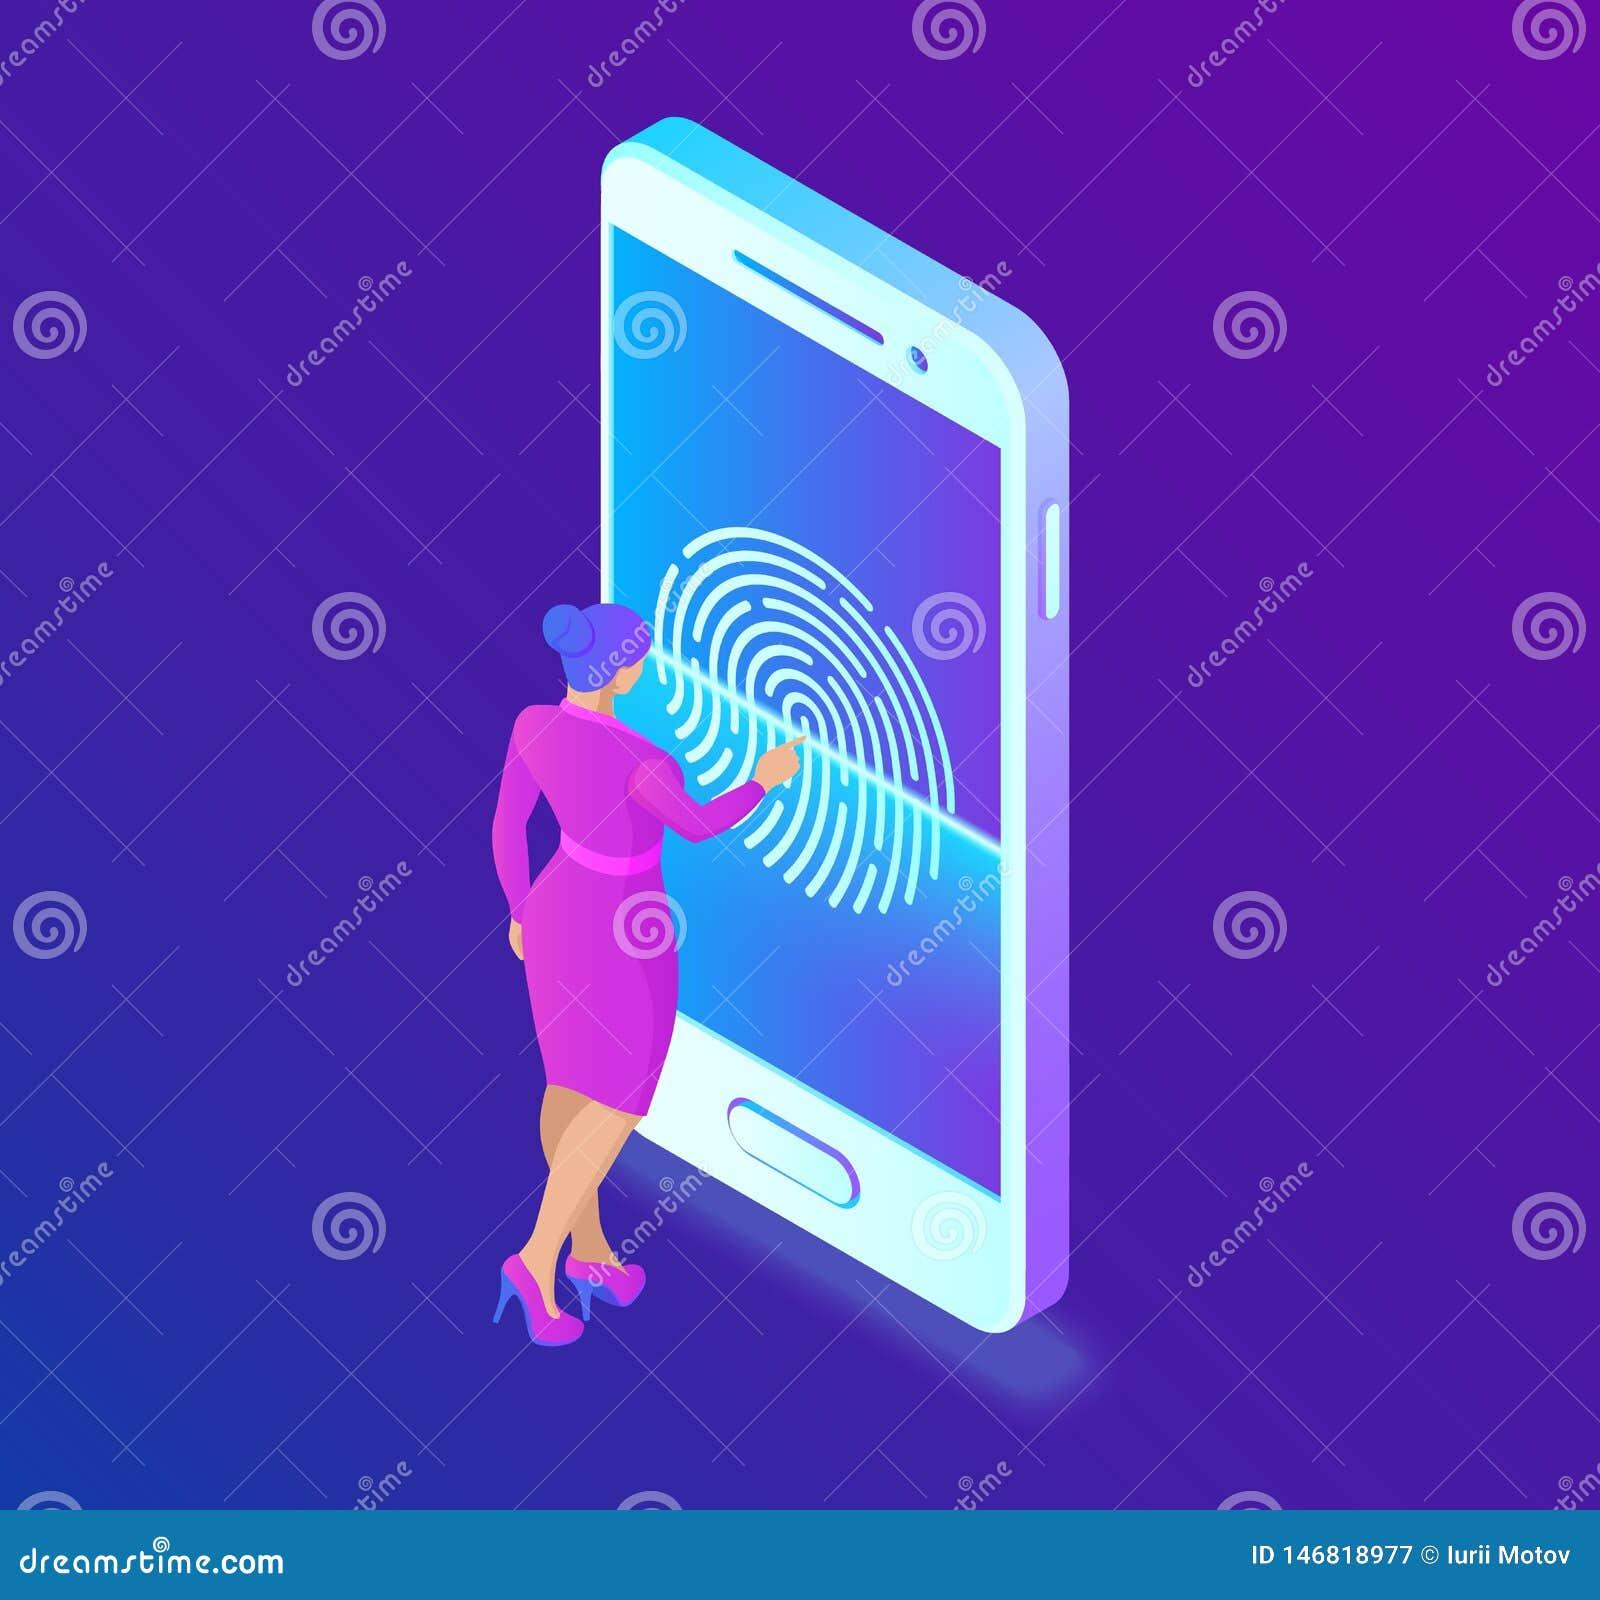 Scanning Fingerprint On Smartphone  Unlock Mobile Phone  Biometrics